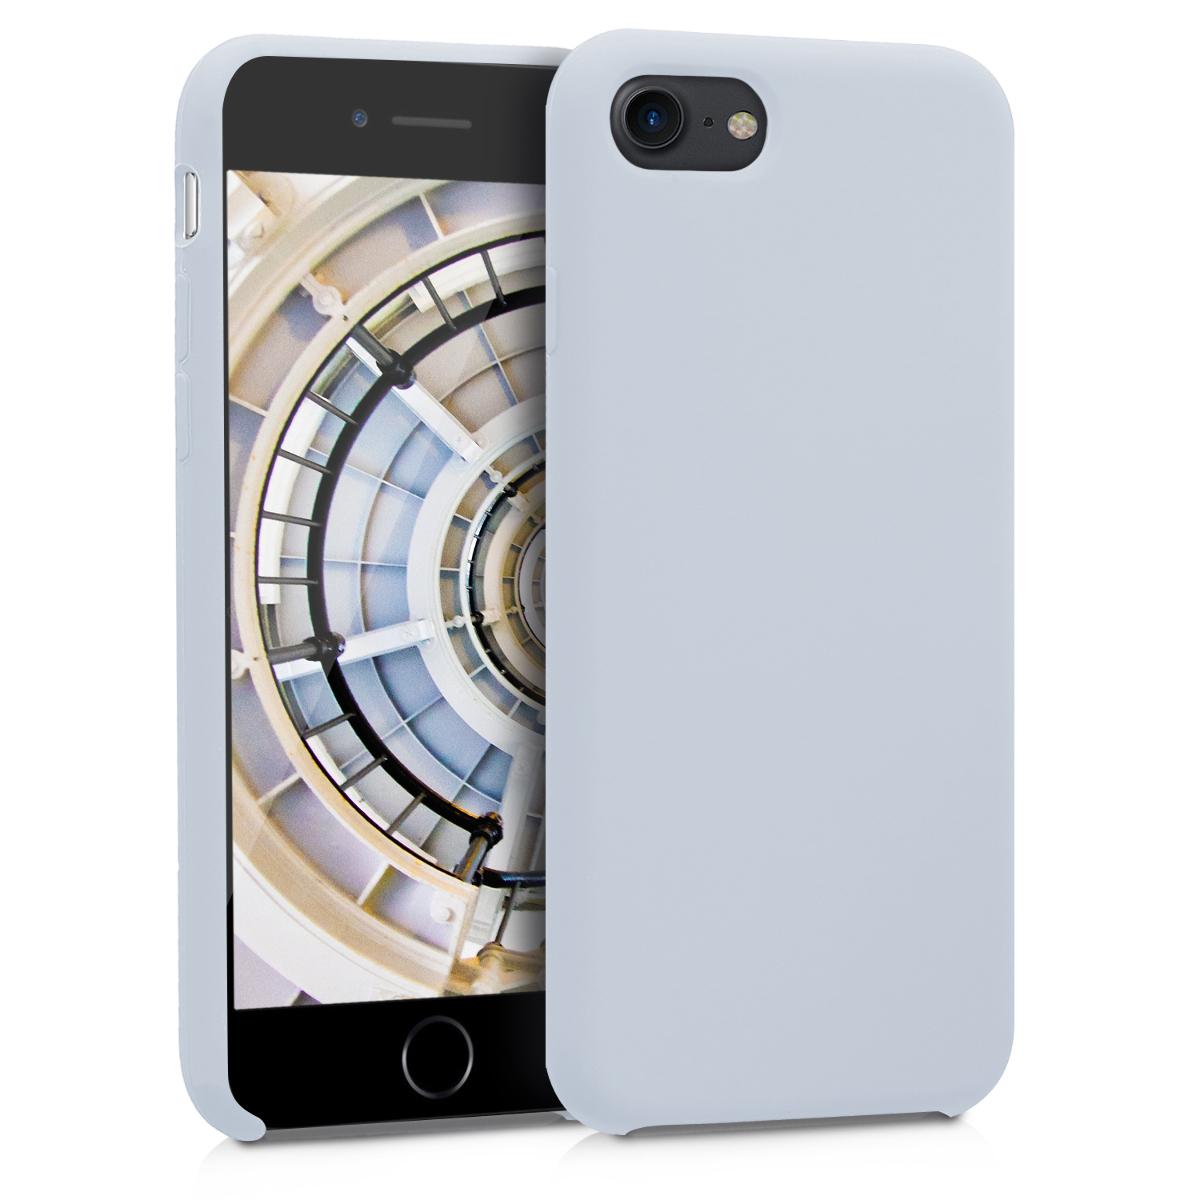 KW Θήκη Σιλικόνης iPhone 8 / 7 - Light Grey Matte (40225.70)